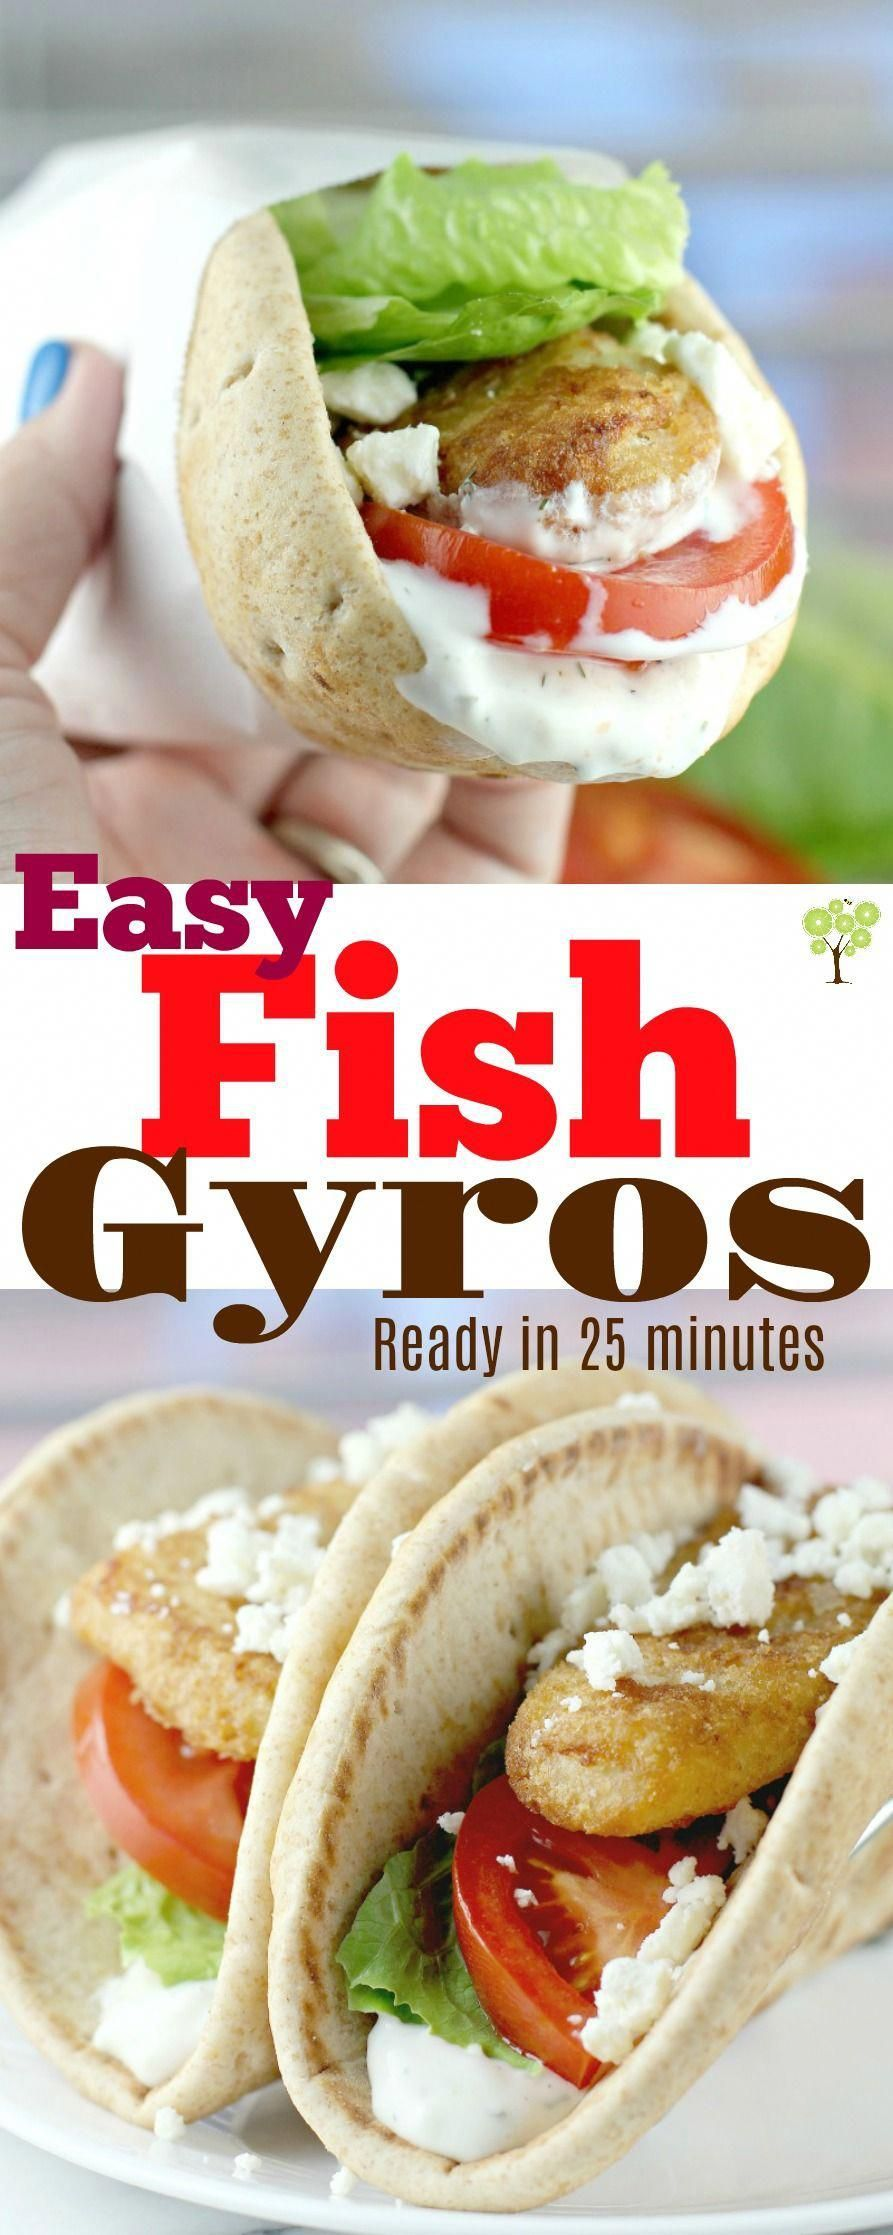 Easy Fish Gyros #GortonsMealTime #TrustGortons #food #Lent #recipe #seafood #quickdinner #ad #FishRecipes